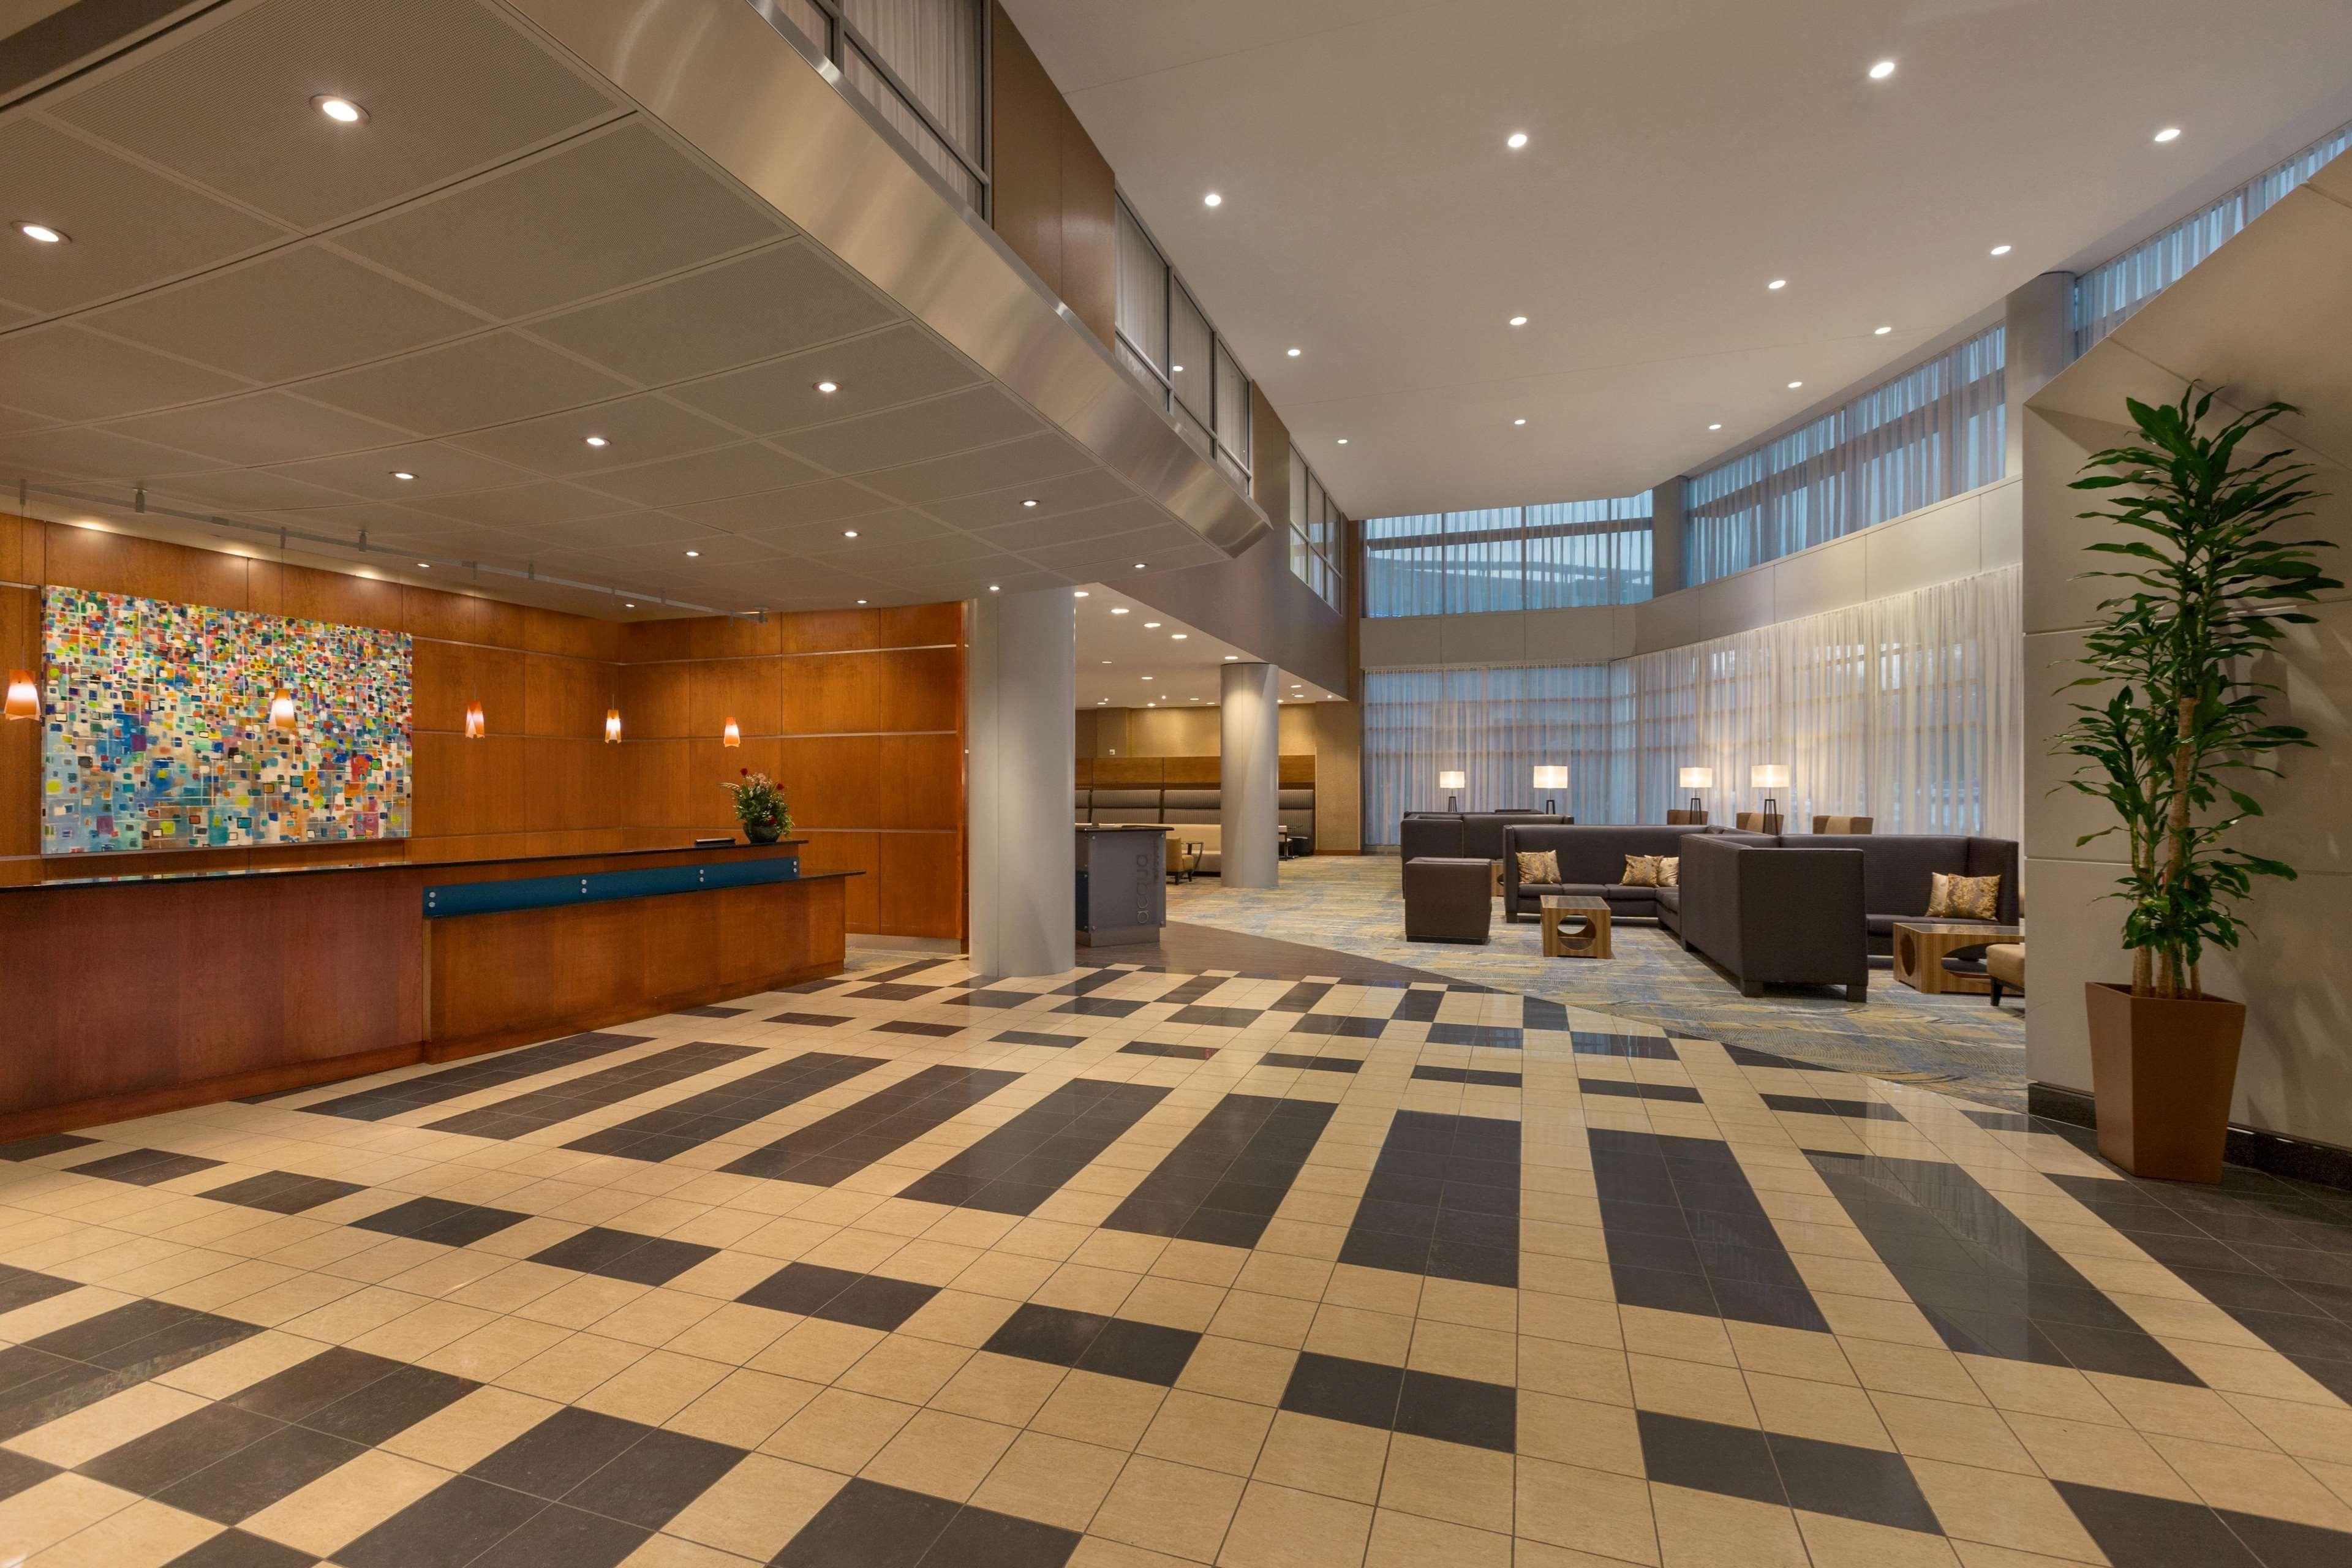 Hilton Baltimore BWI Airport image 3